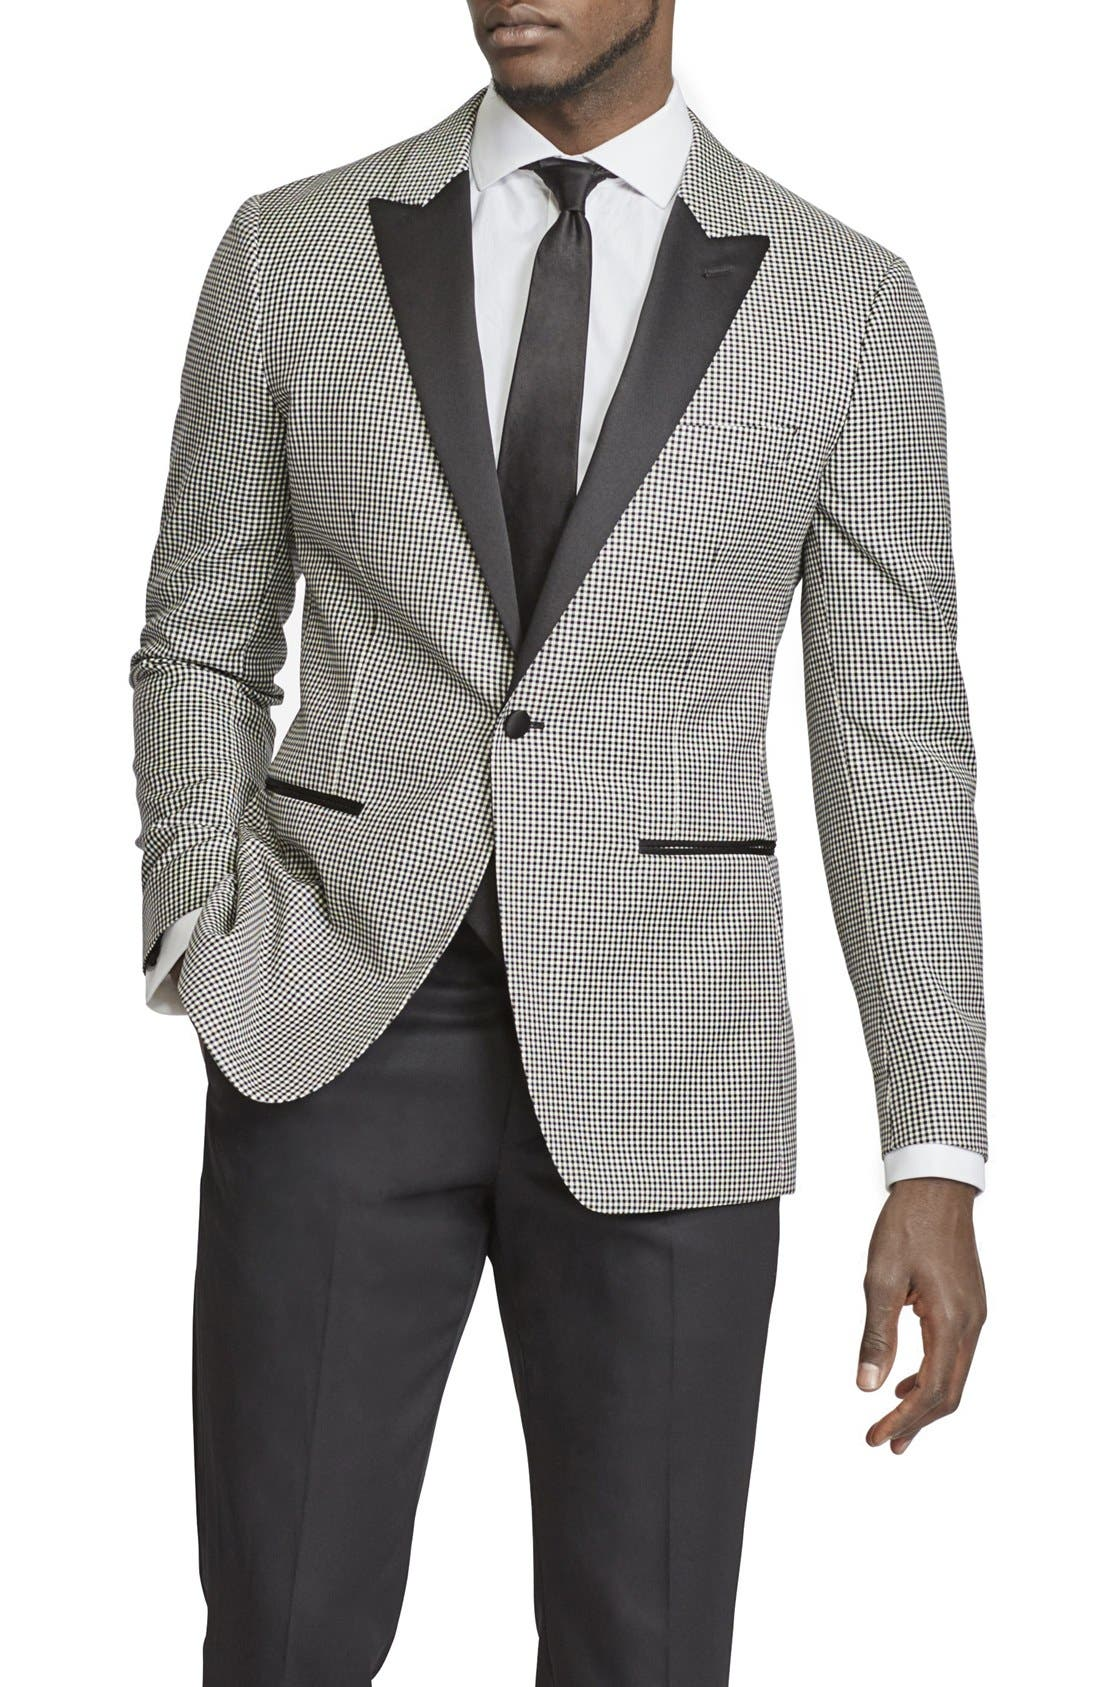 BONOBOS, Trim Fit Check Wool Dinner Jacket, Main thumbnail 1, color, 001